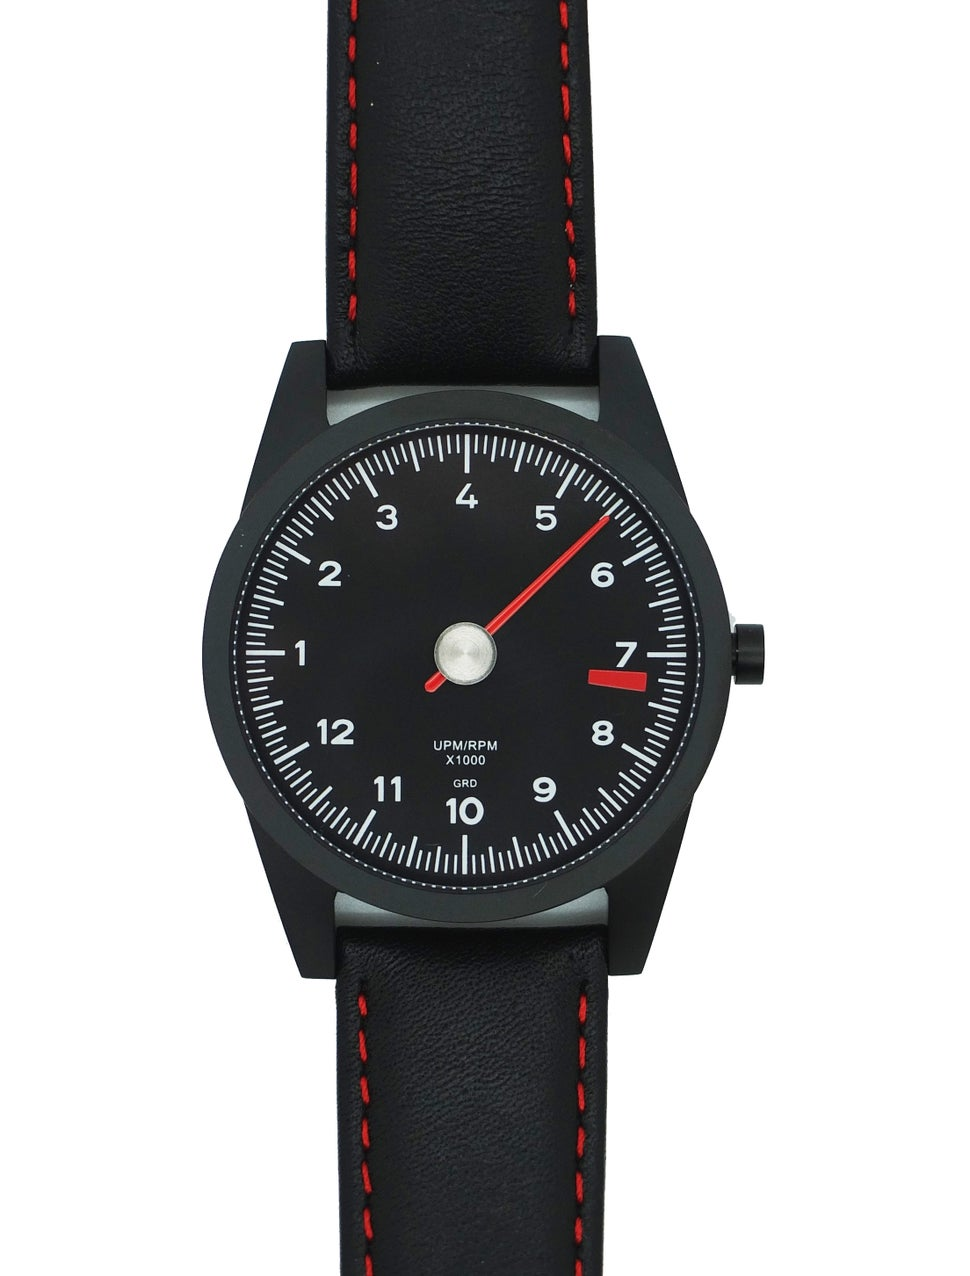 Image of GuardsRed-Design RL-72 Watch